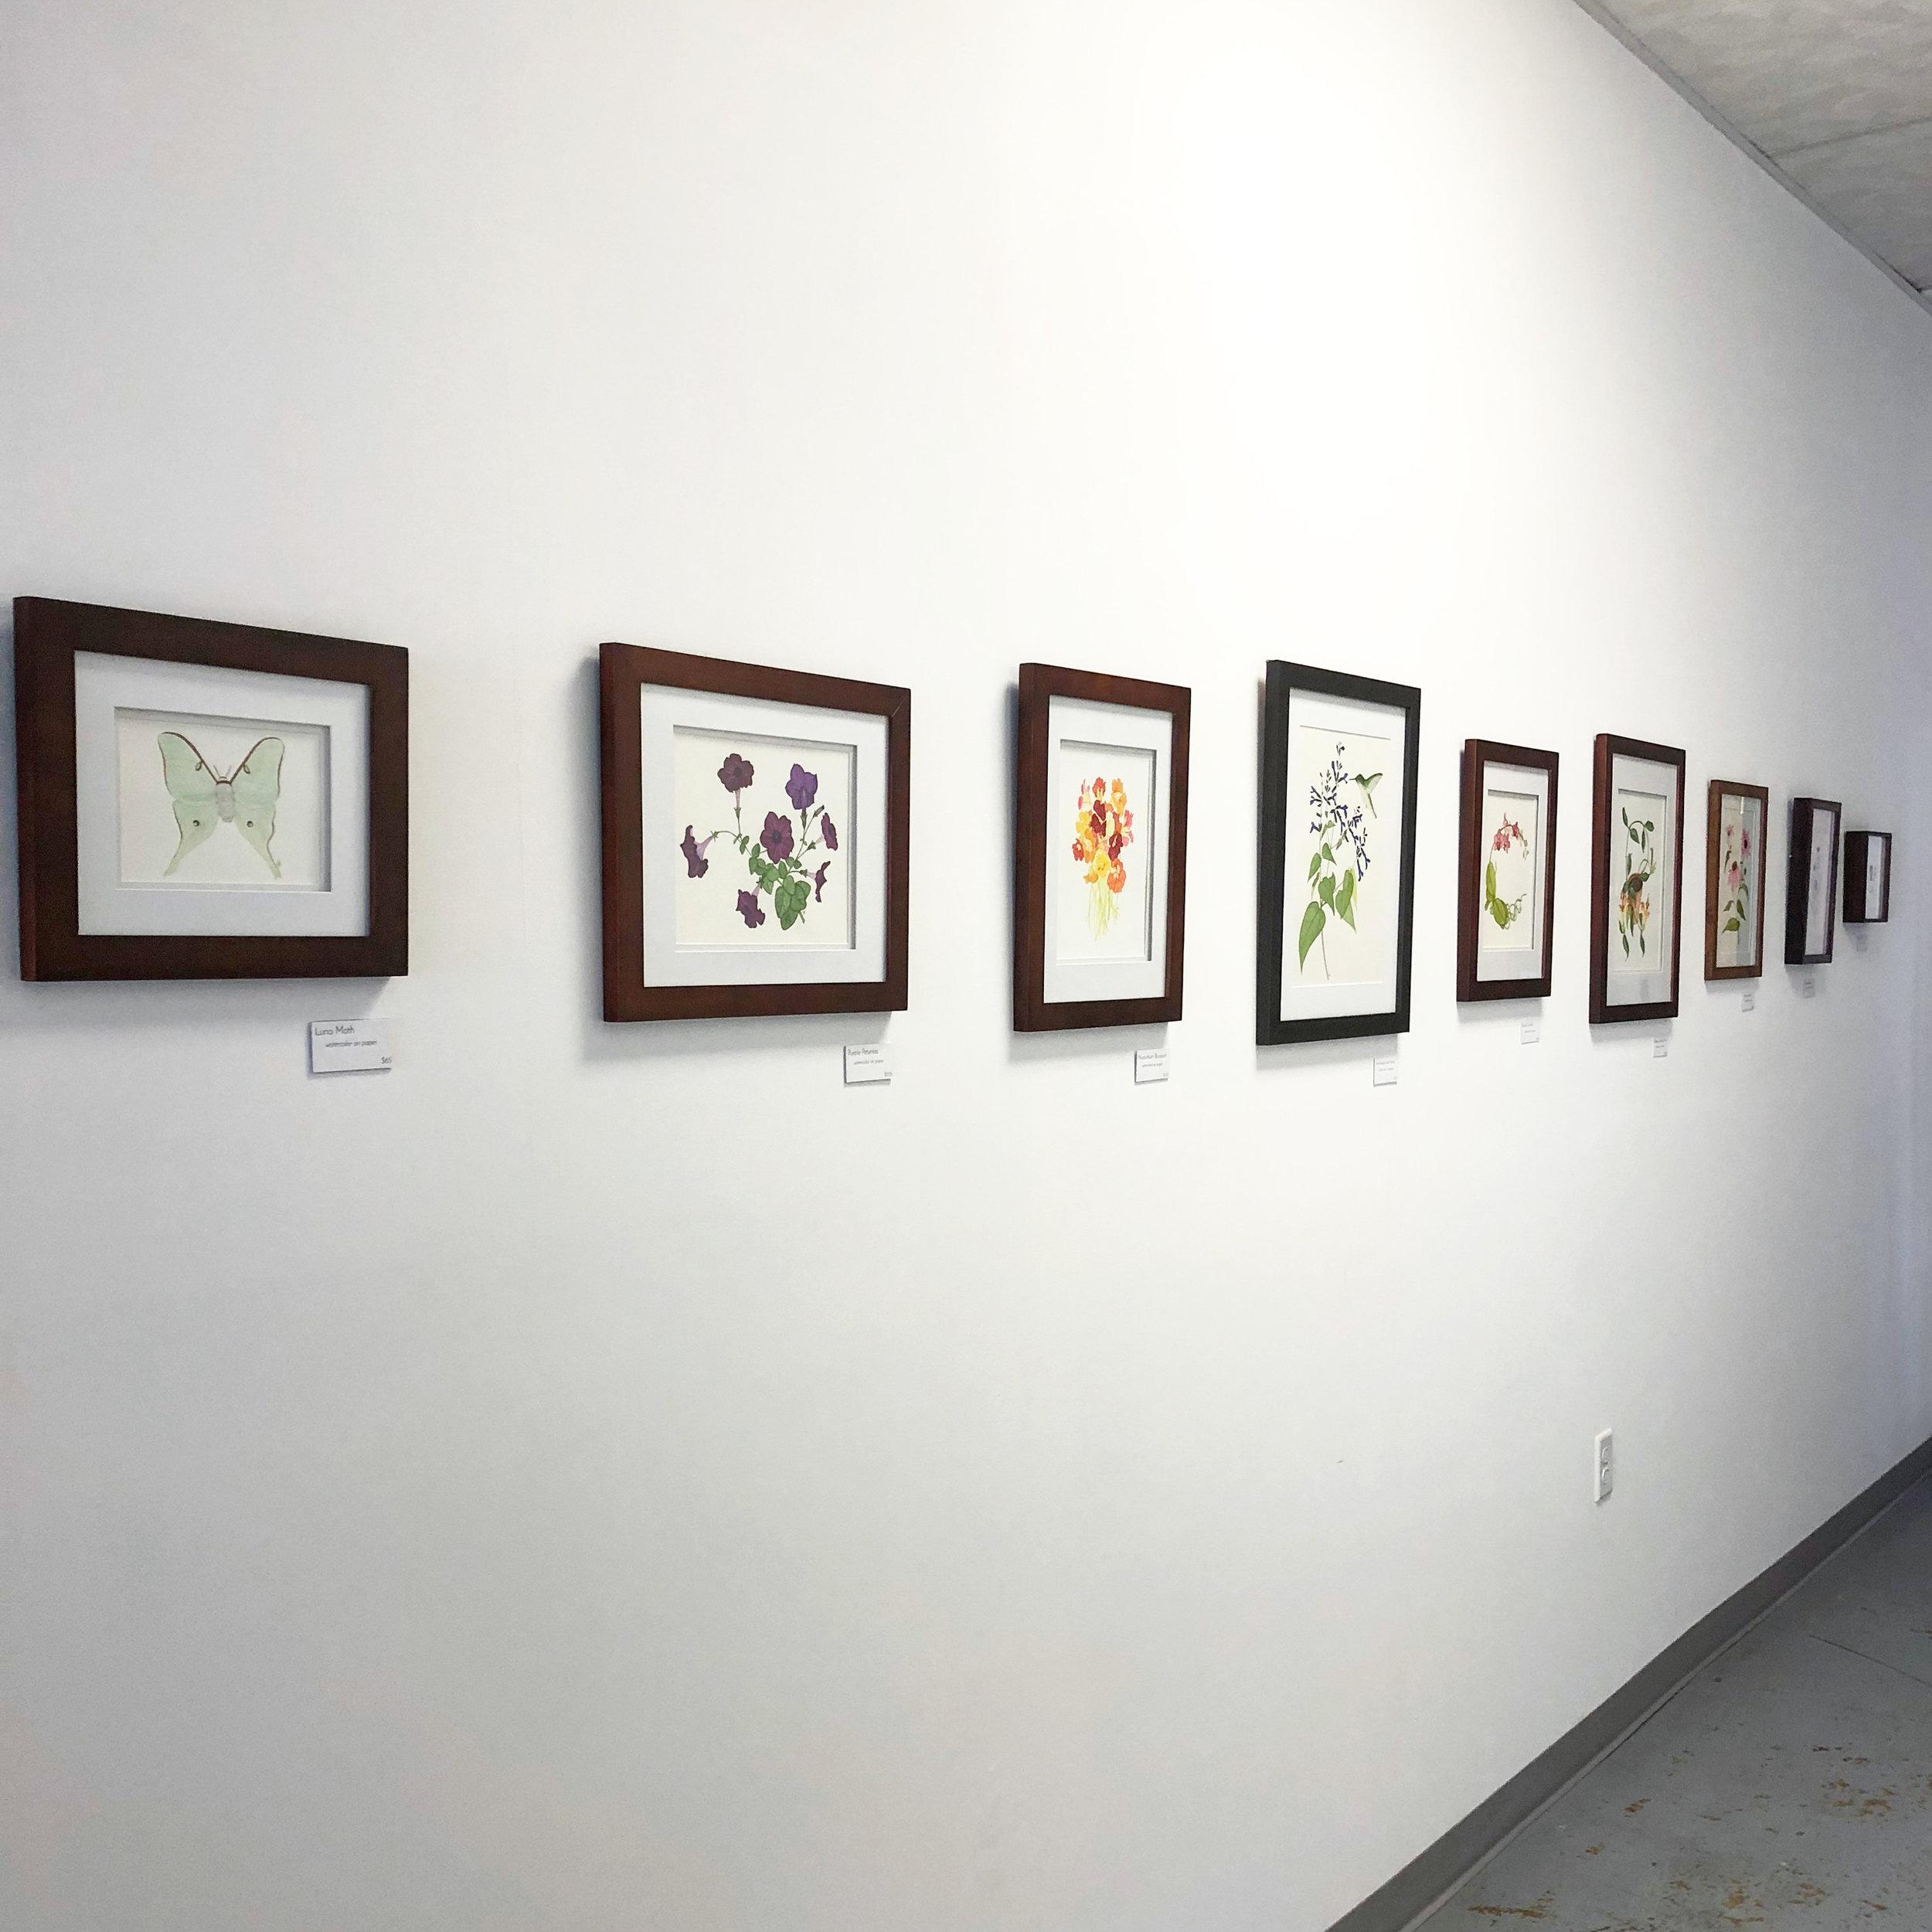 Anne Butera's Art on Exhibit at Mac Help in Viroqua, Wisconsin